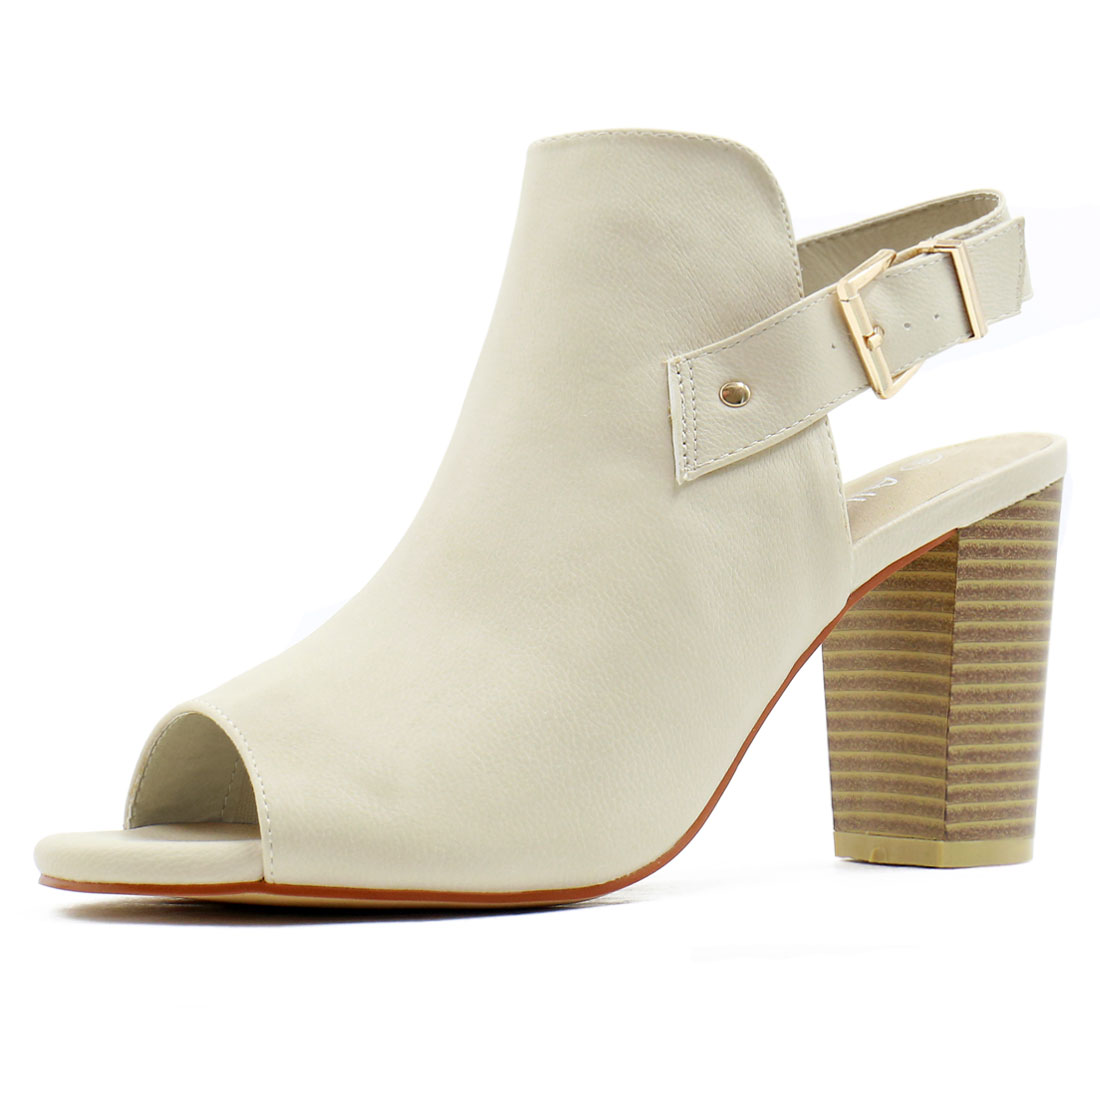 Women Peep Toe Slip On Stacked Heel Slingback Sandals Off White US 5.5